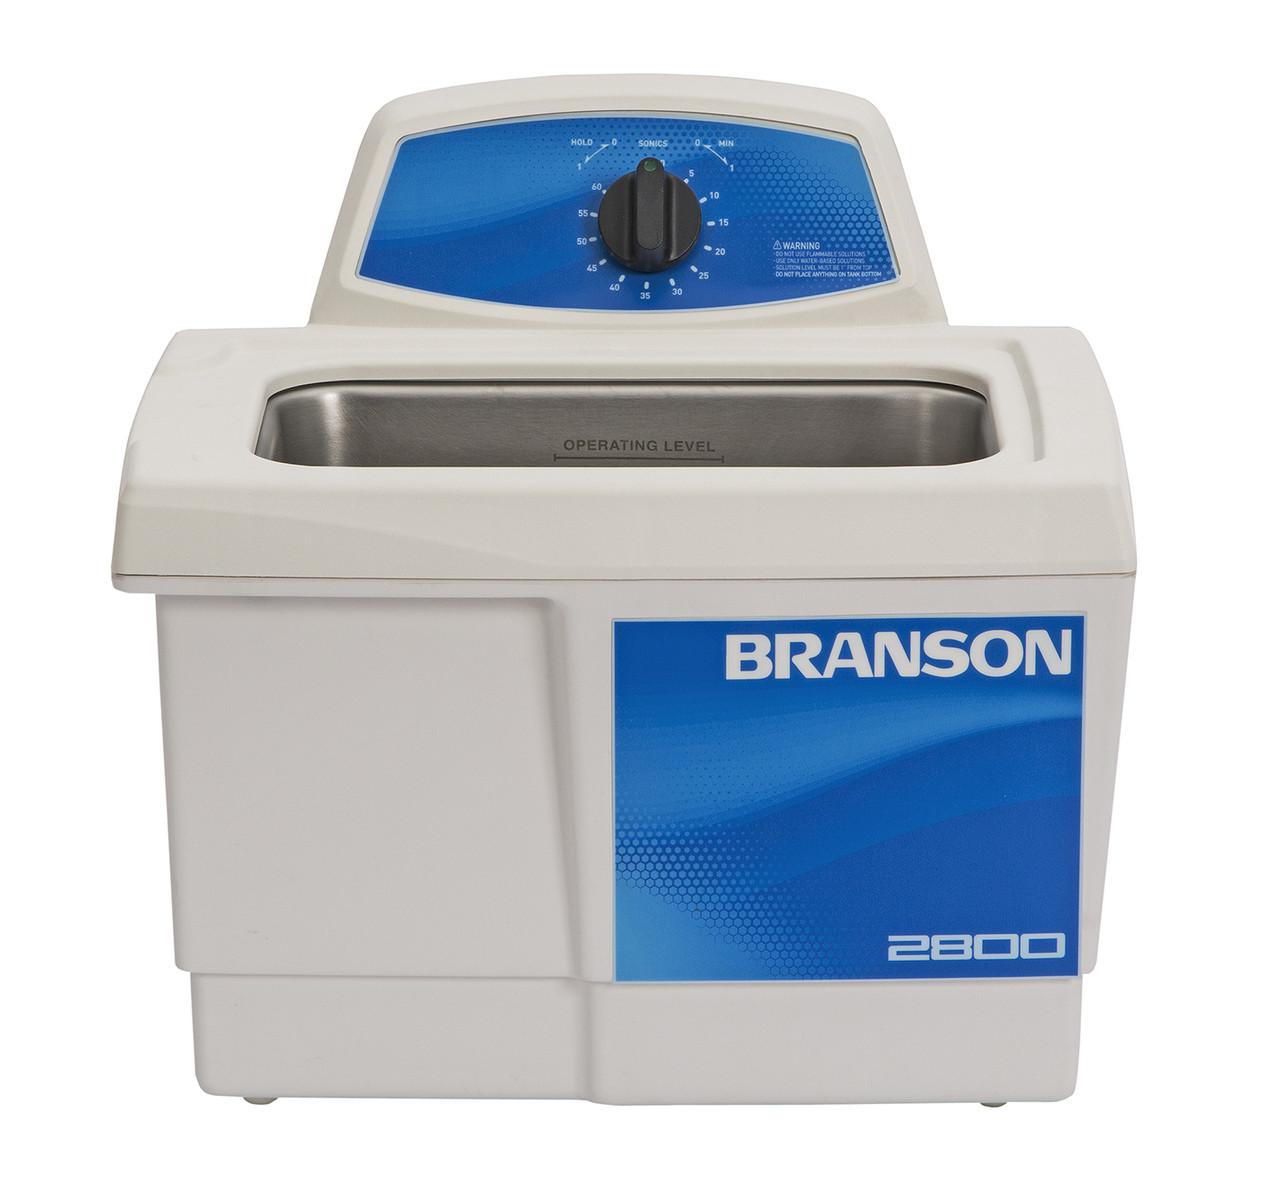 Branson M3800 Ultrasonic Cleaner